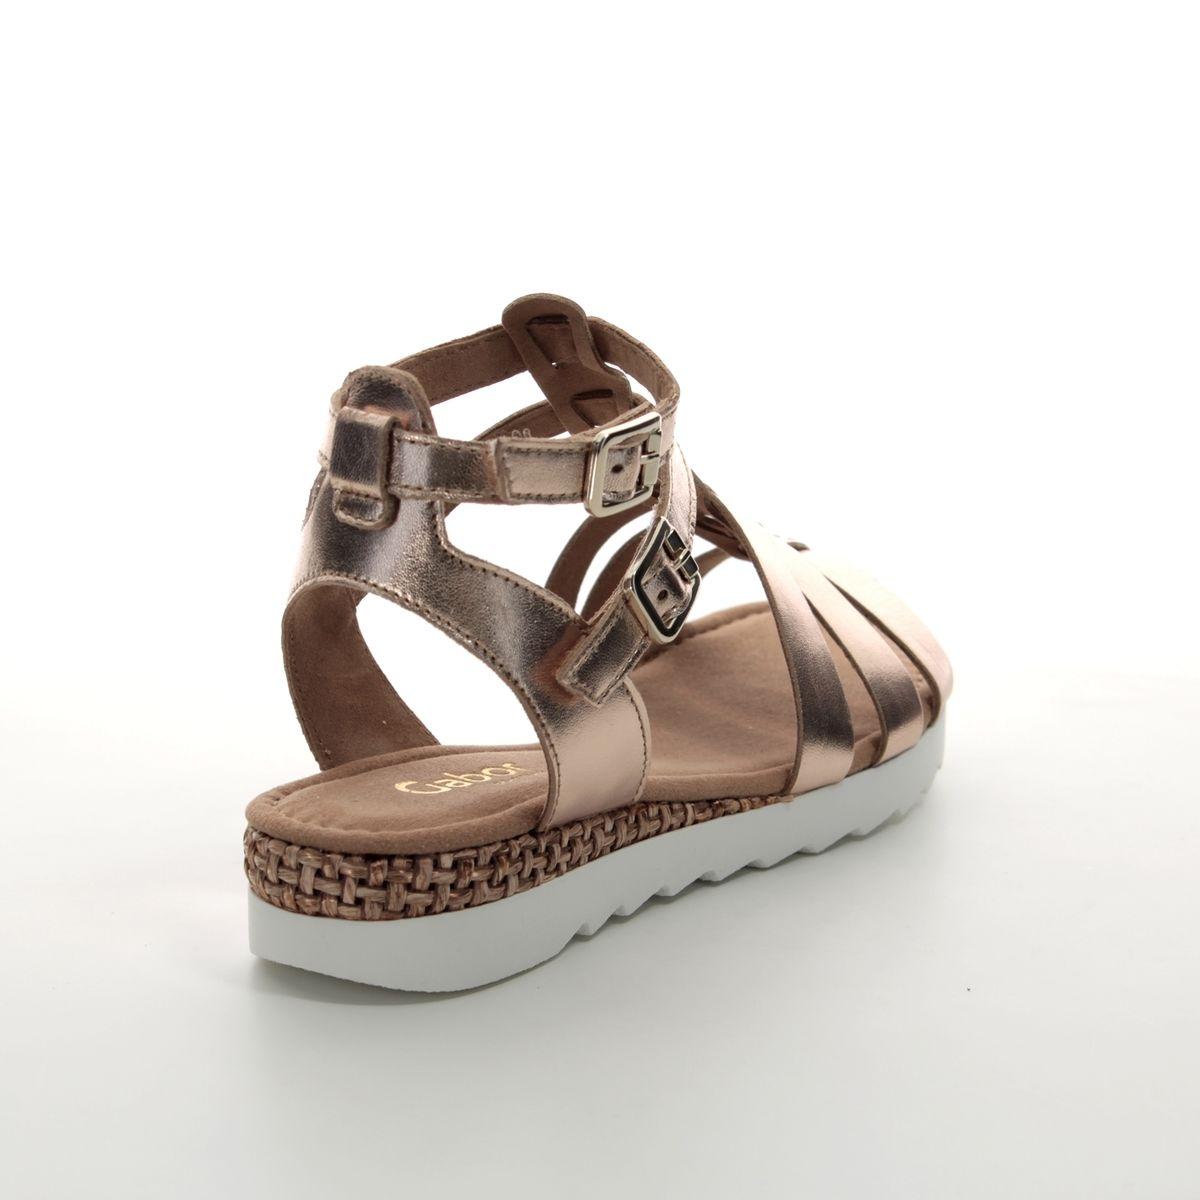 6ff2913042ac Gabor Gladiator Sandals - Pewter - 22.744.94 FELICITY